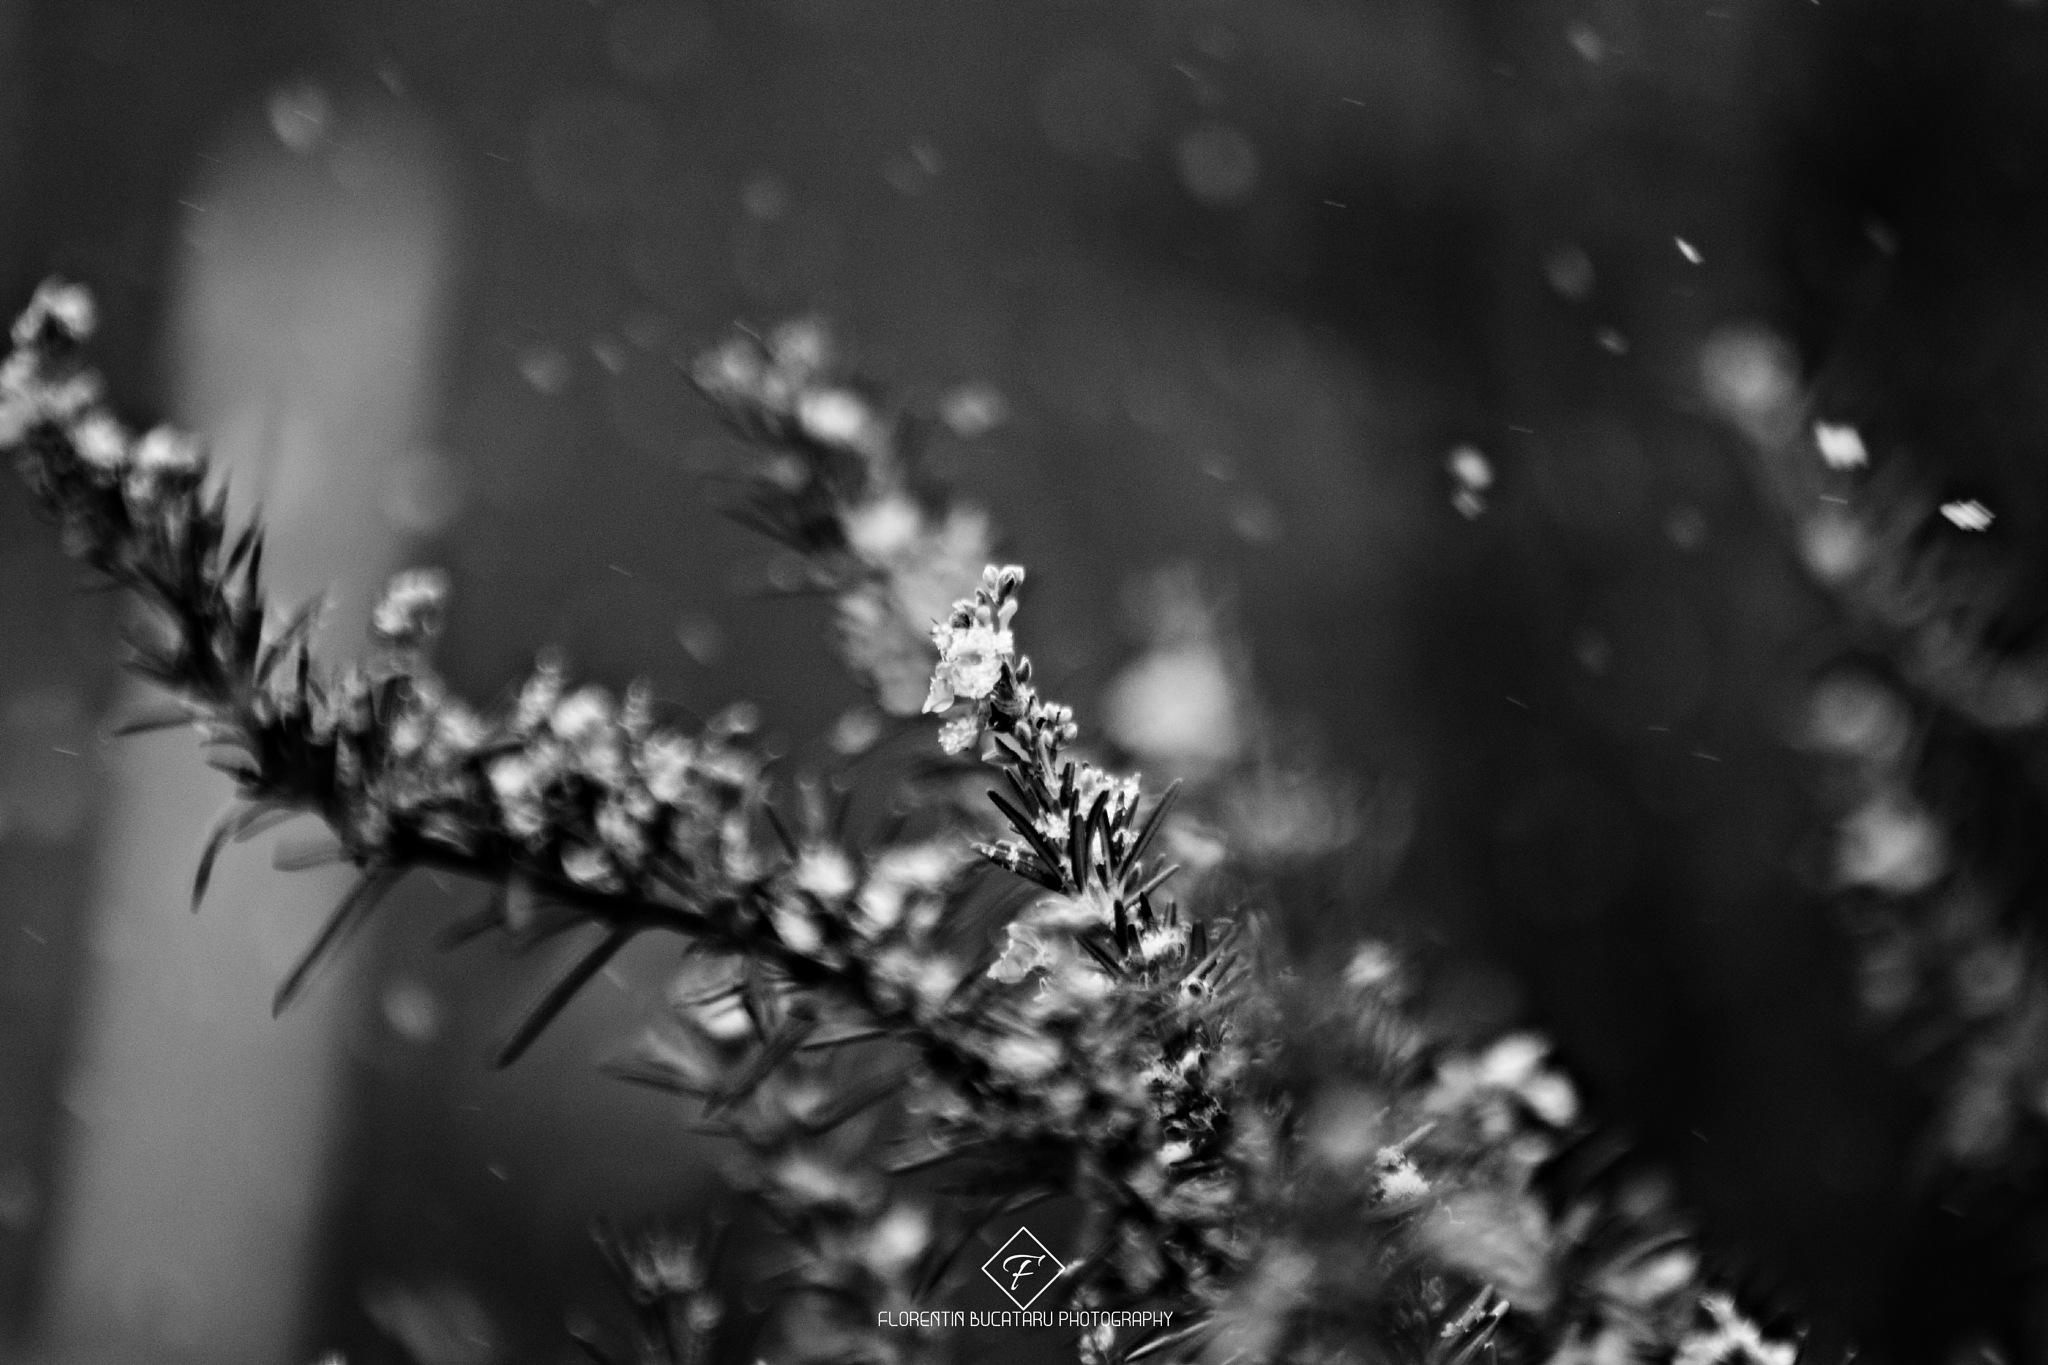 Falling snow by Florentin Bucataru